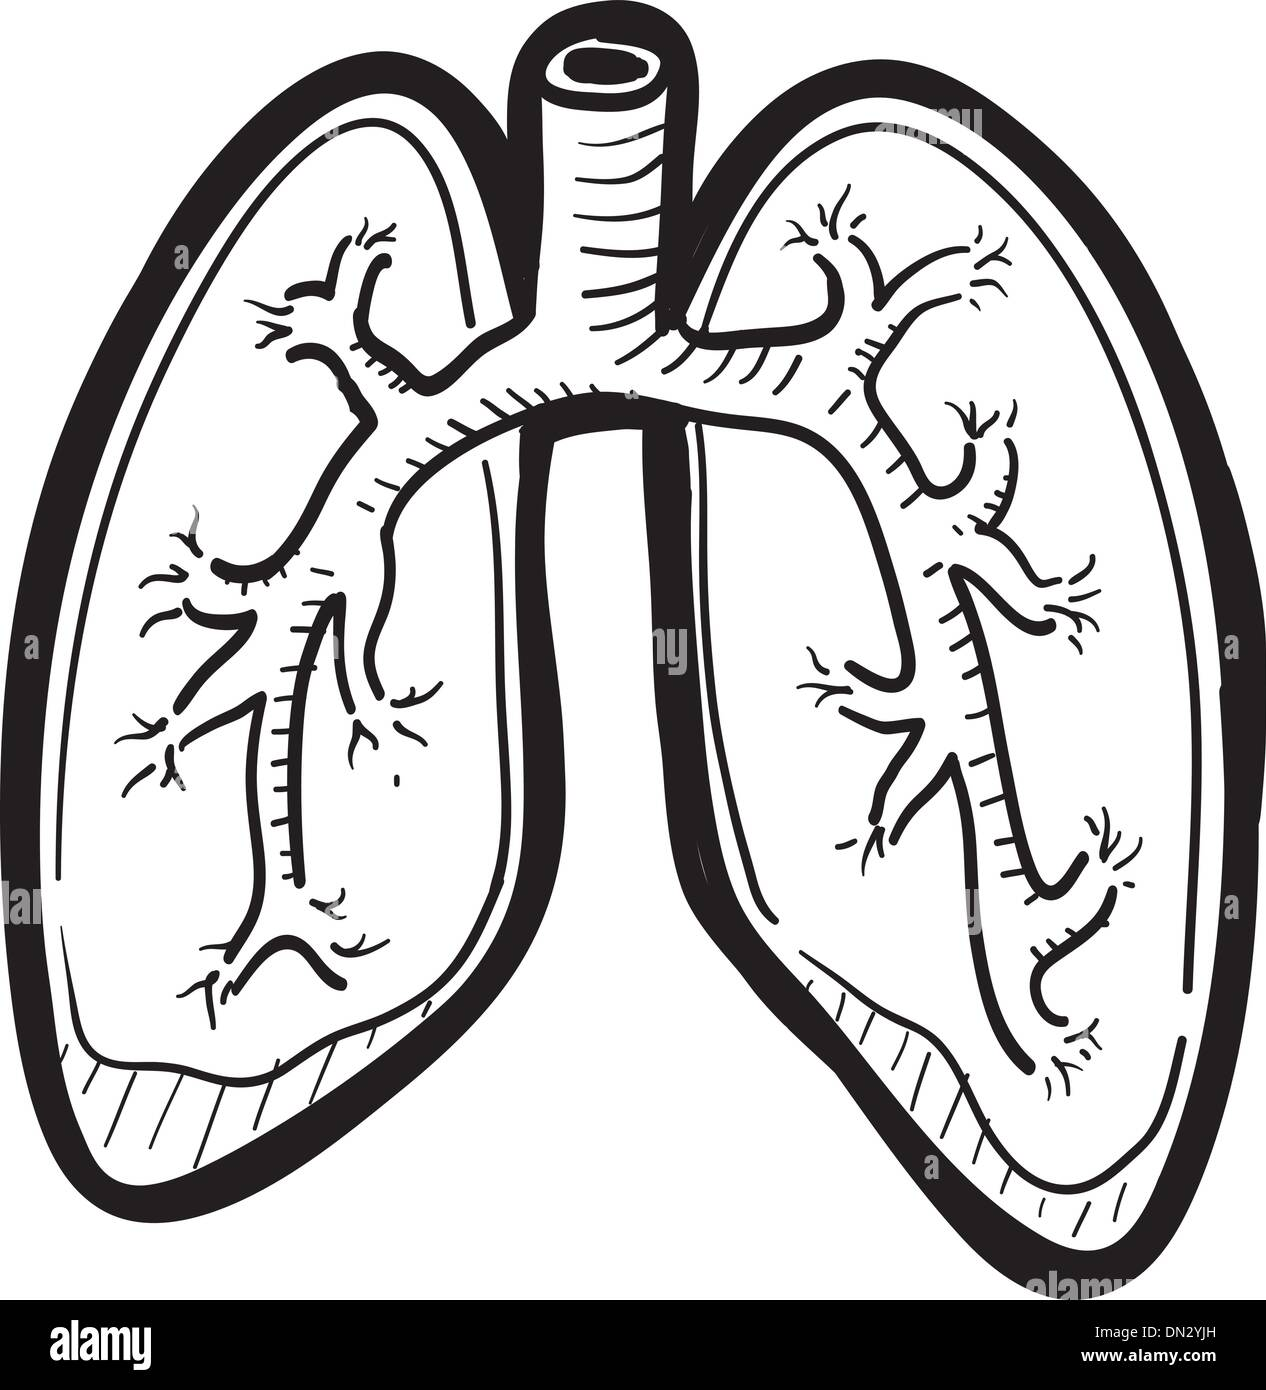 Human Lung Sketch Stock Vector Art U0026 Illustration Vector Image 64604473 - Alamy